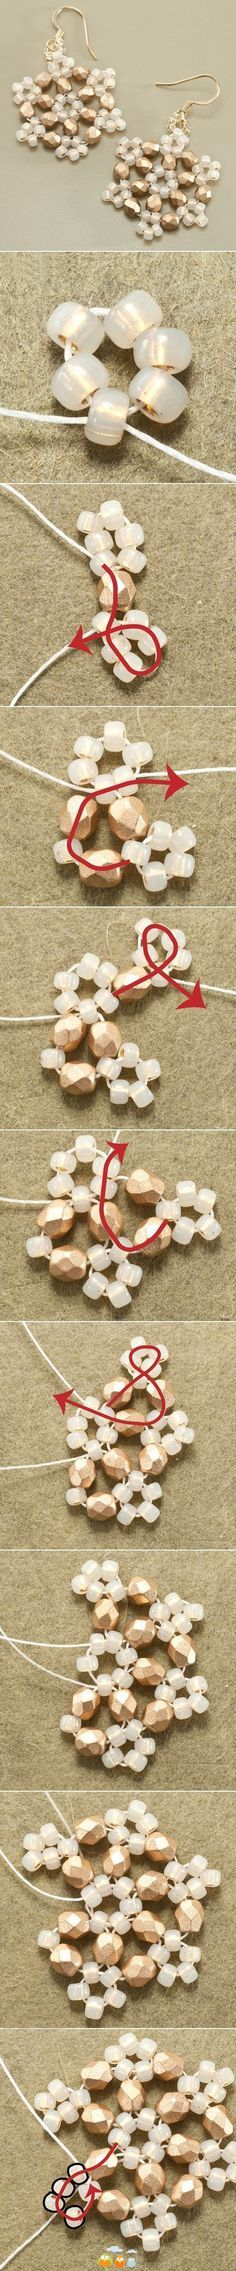 http://www.beadshop.com.br/?utm_source=pinterest&utm_medium=pint&partner=pin13 / Crie com pedrarias Bead Shop!